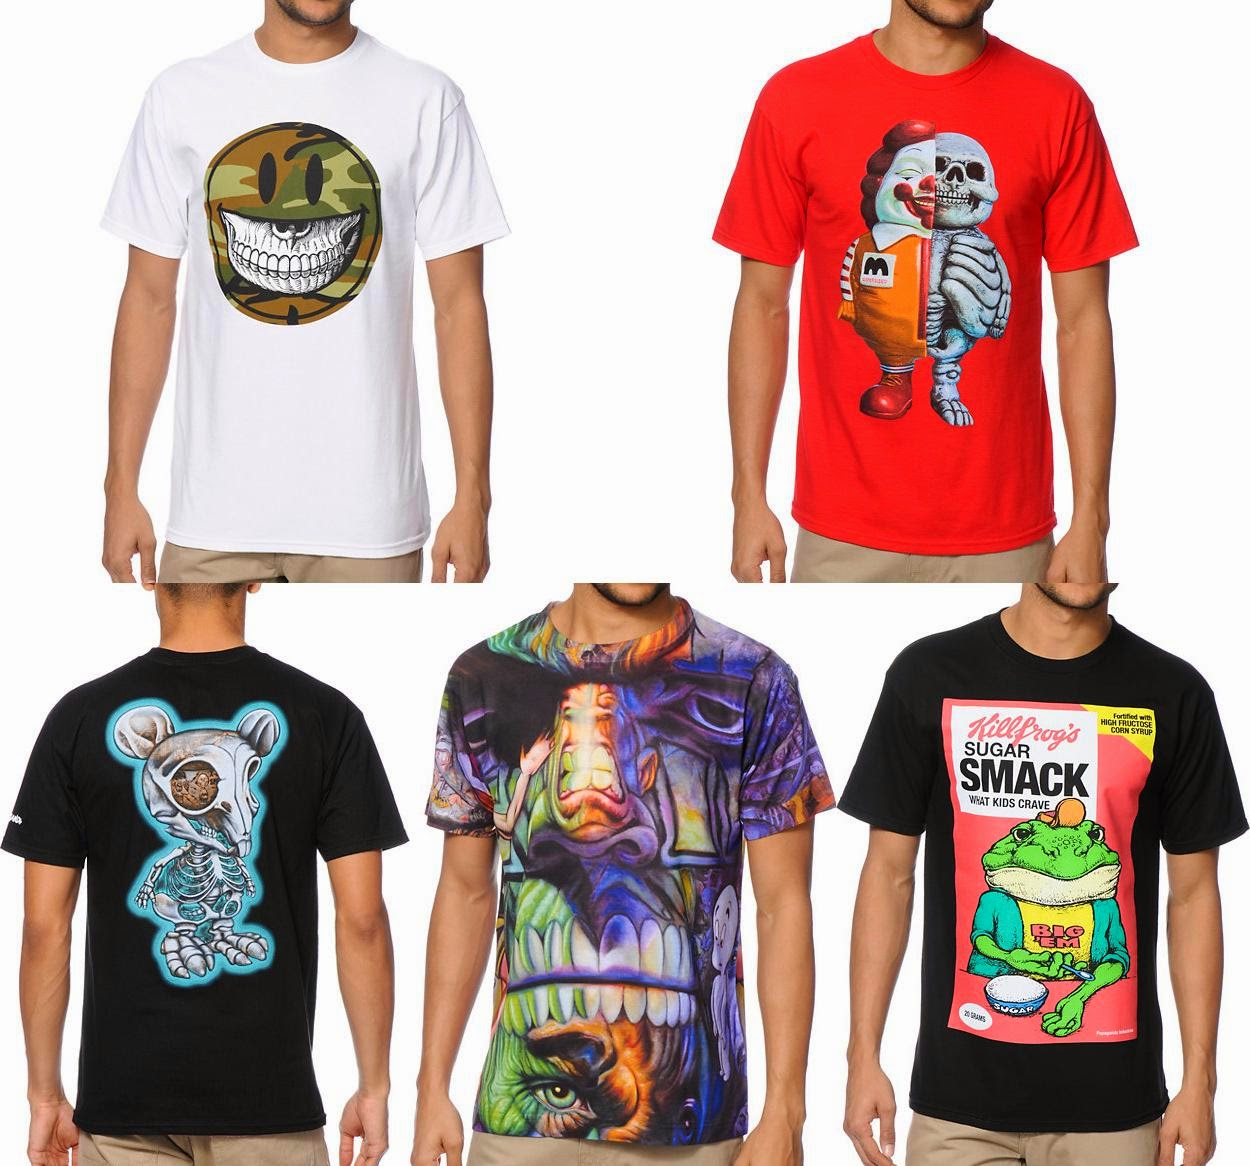 fe7e32eef2b The Blot Says...  POPaganda Streetwear T-Shirt Collection by Ron English